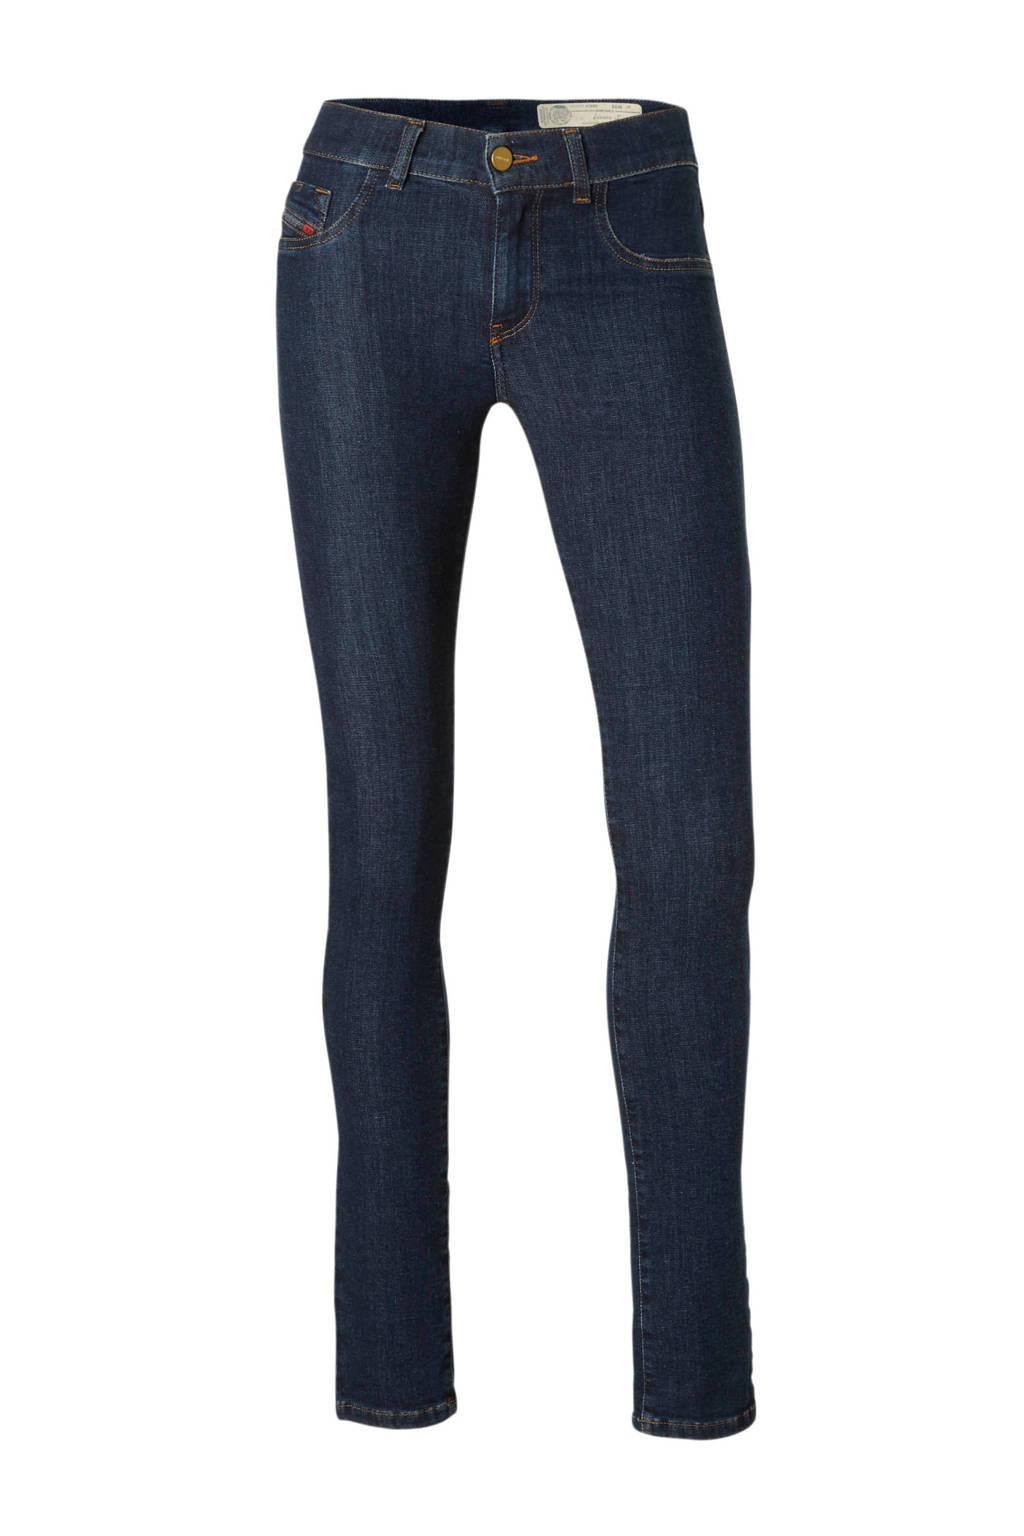 Diesel Livier-S super slim-jegging low waist fit jeans, Blauw